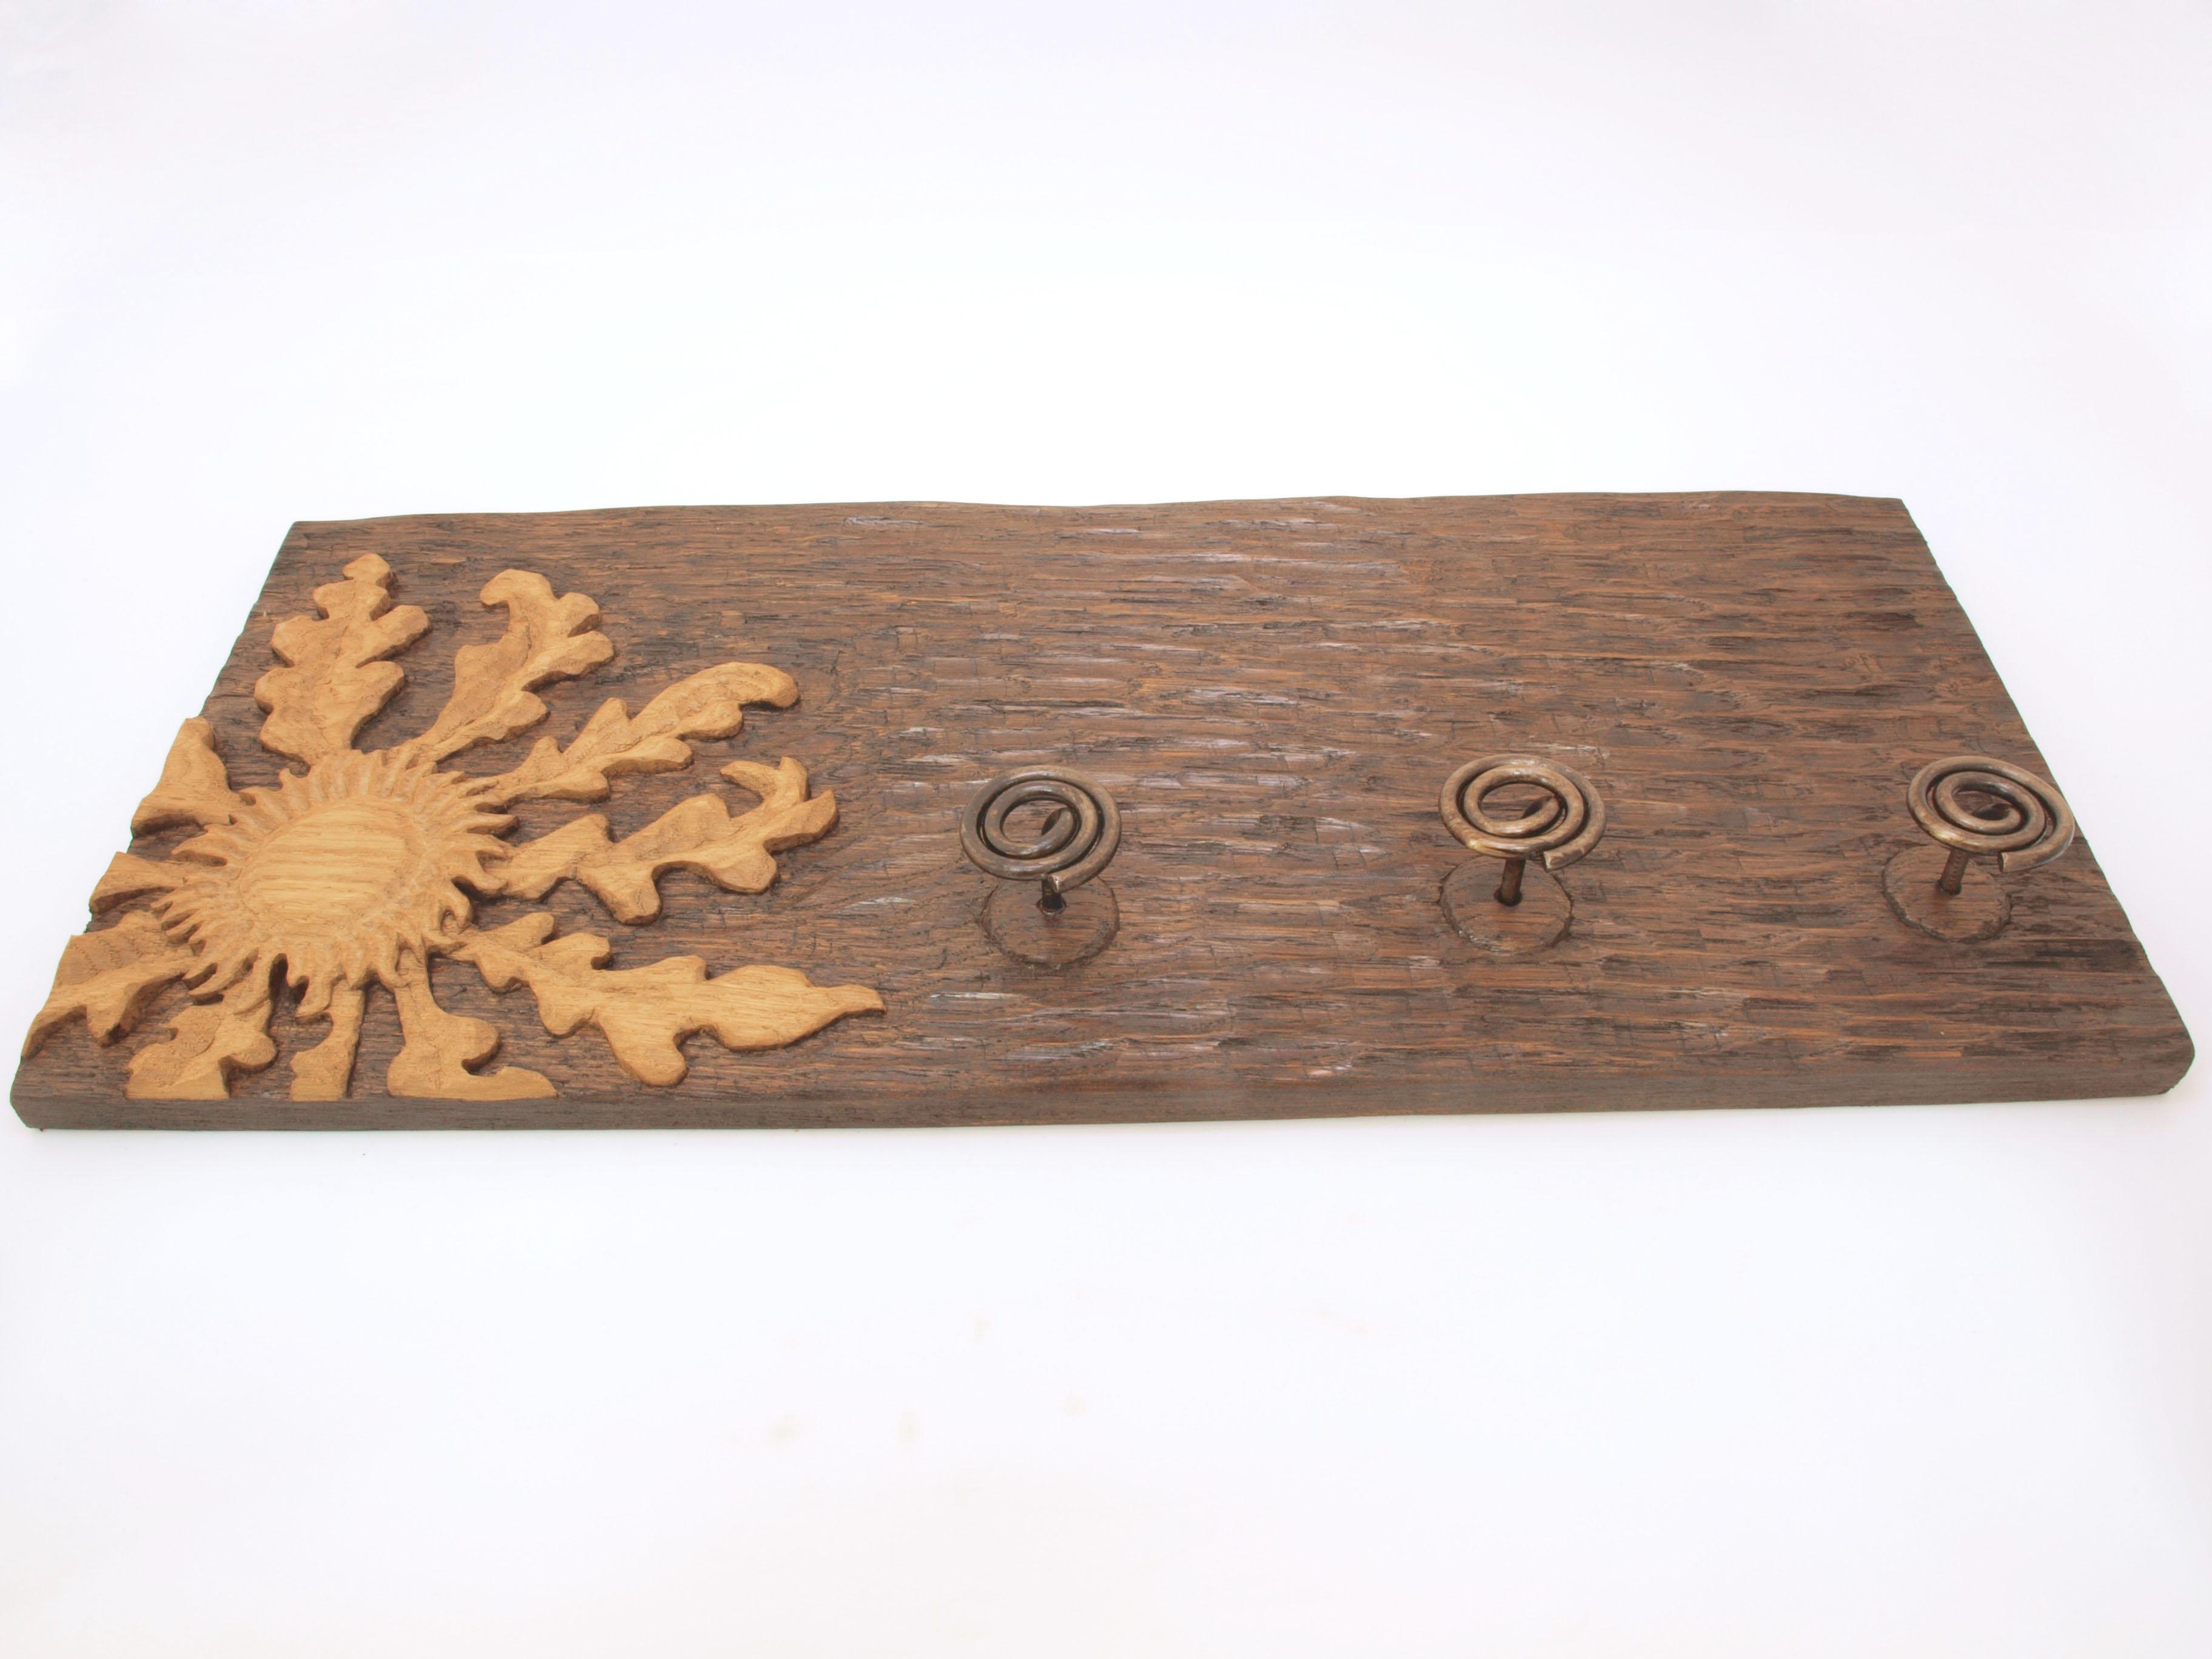 Perchero con eguzkilore tallado en madera de roble en altorrelieve